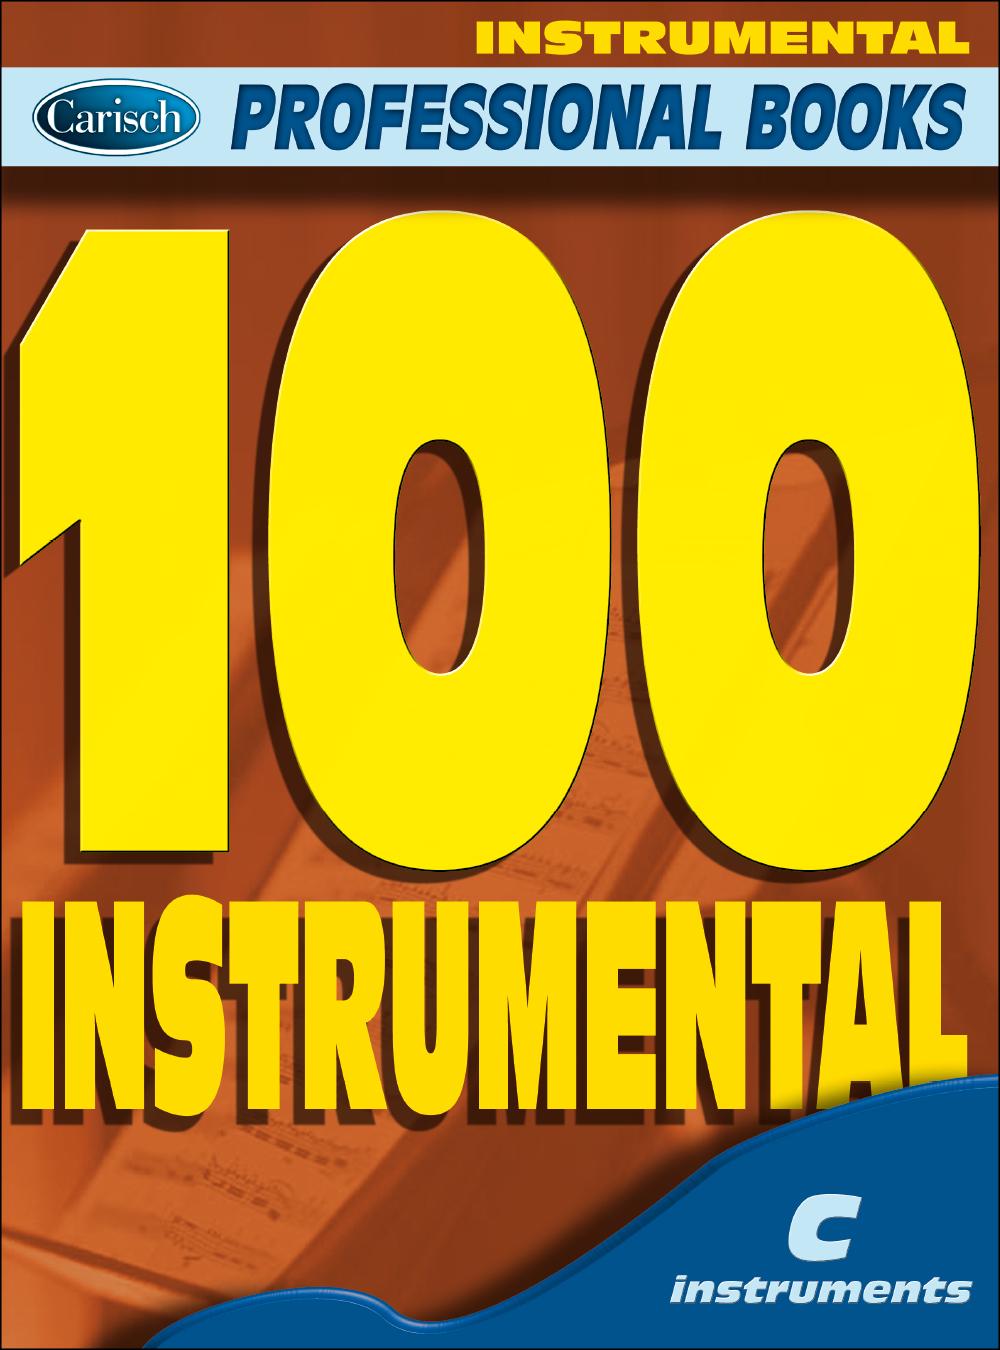 100 Instrumental (C Instrument): C Clef Instrument: Mixed Songbook